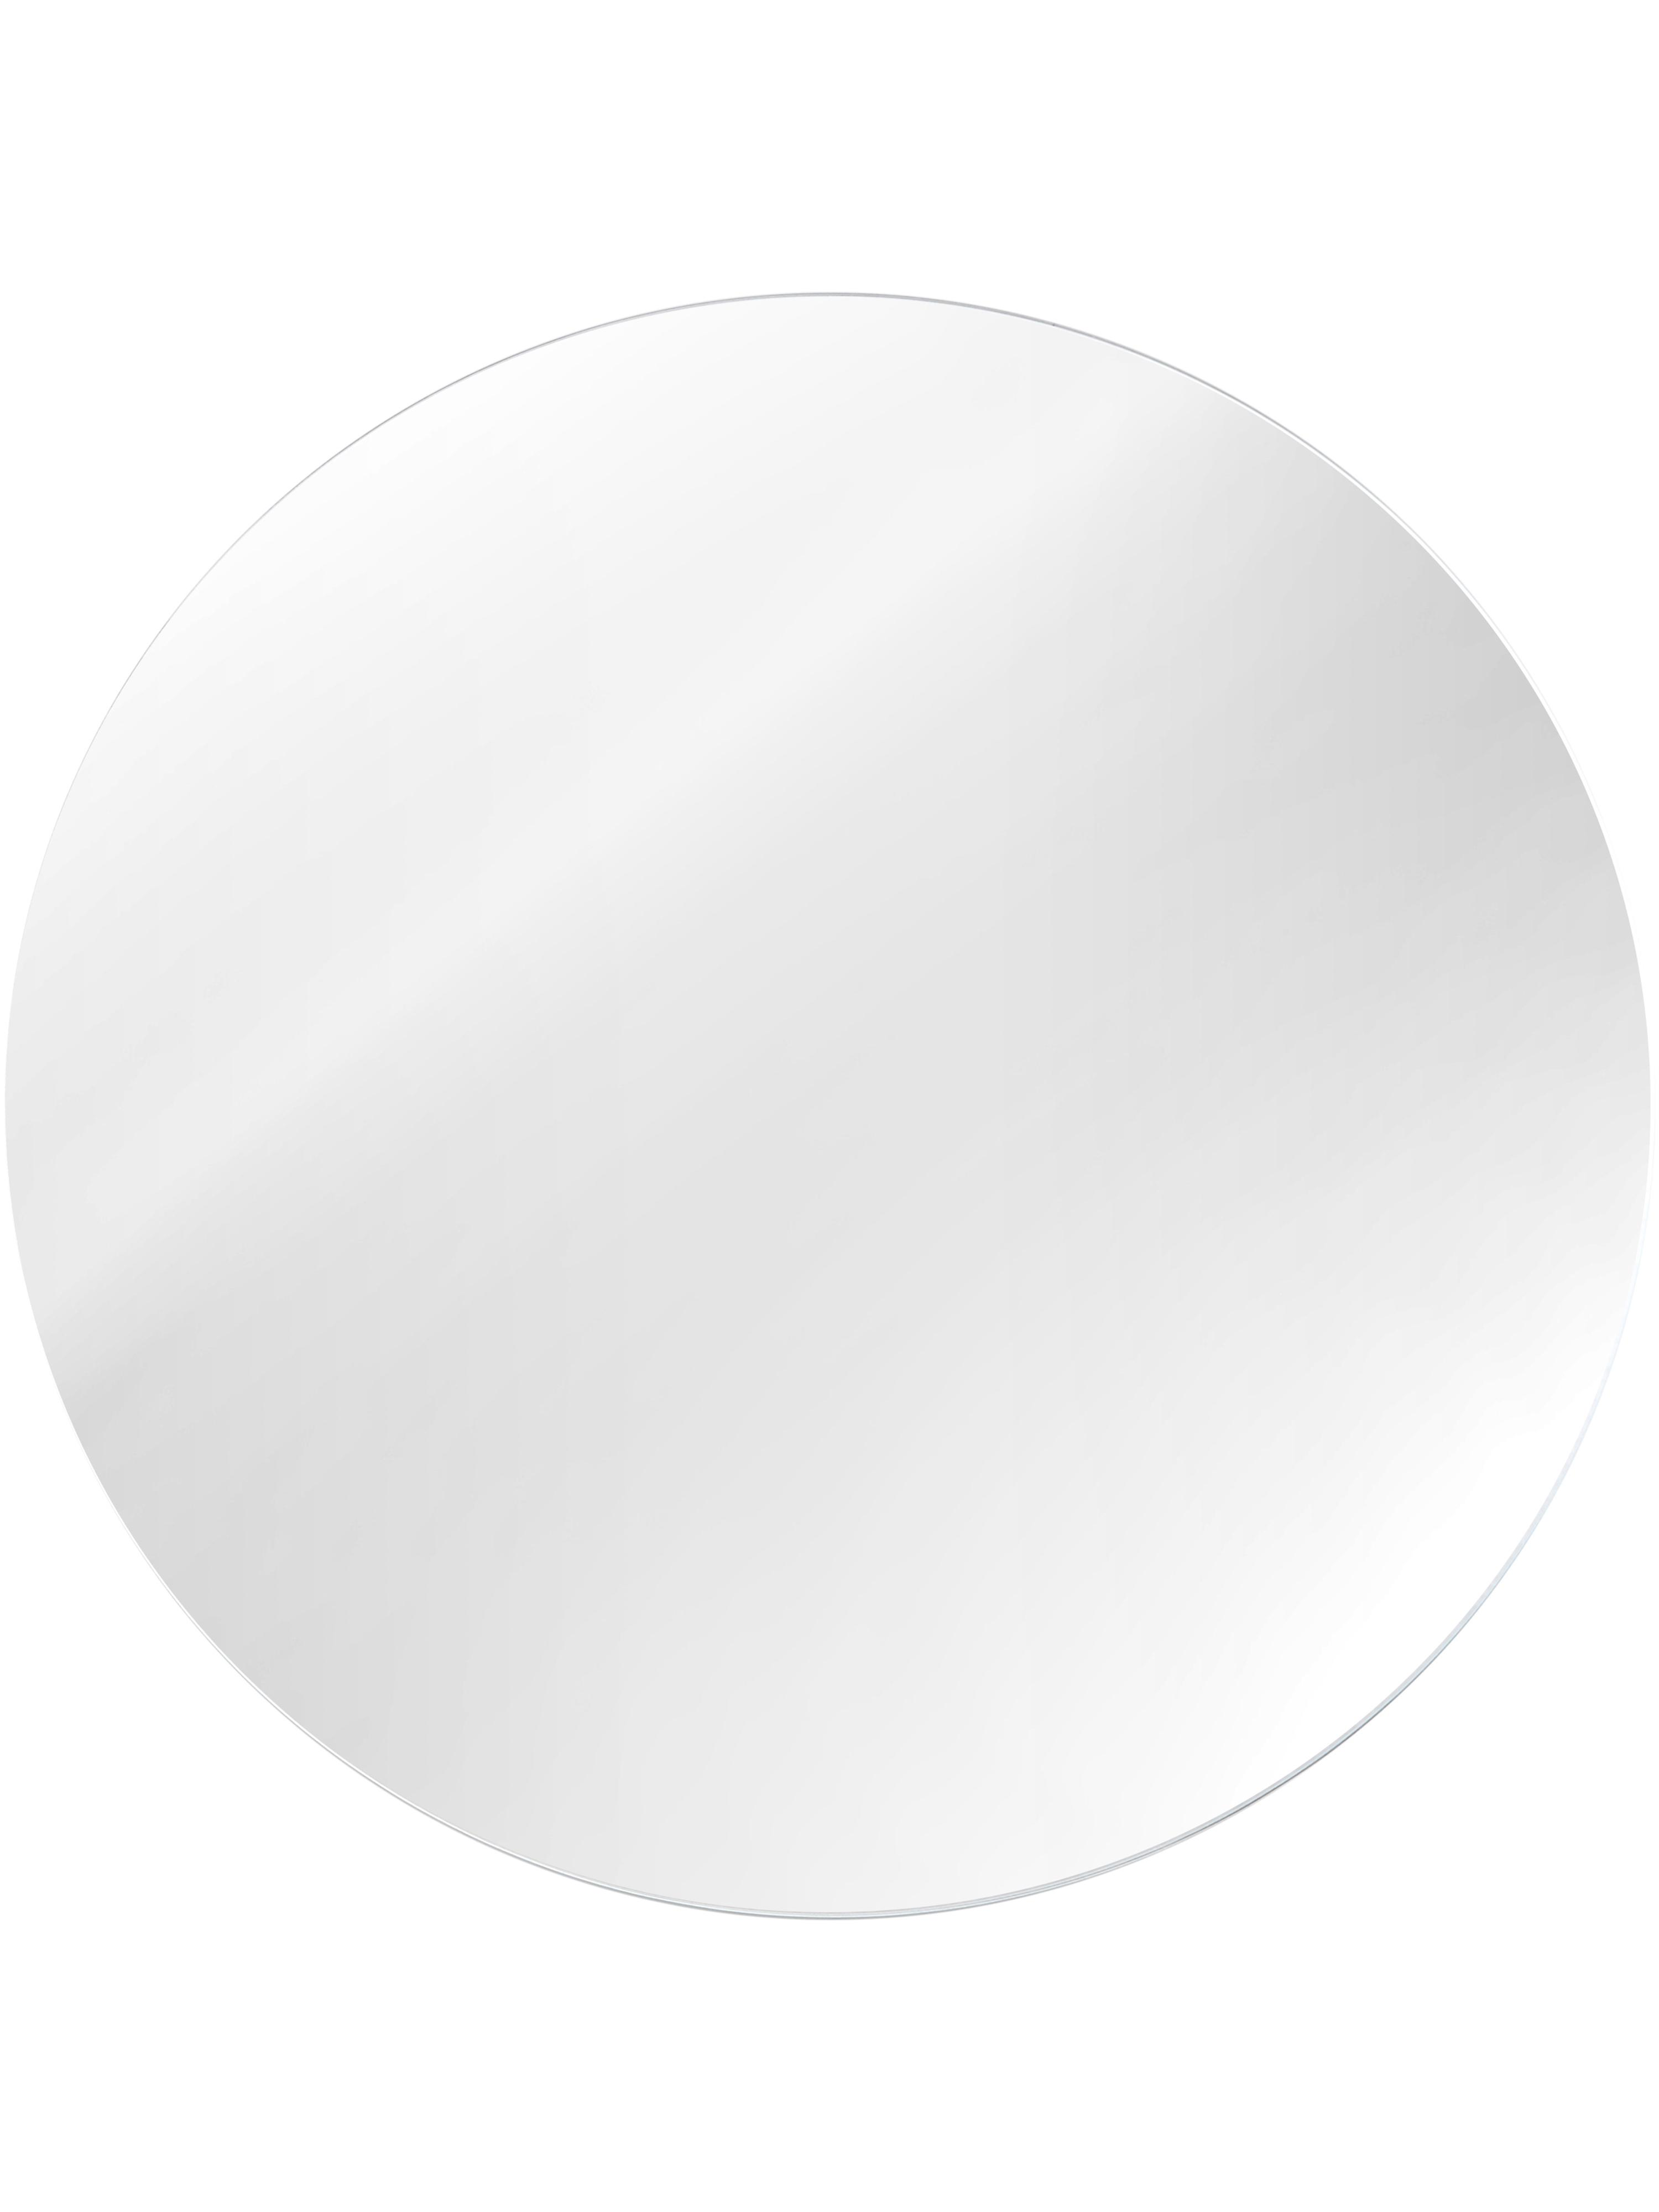 Ronde wandspiegel Erin zonder lijst, Spiegelvlak: spiegelglas. Buitenrand: zwart, ∅ 90 cm